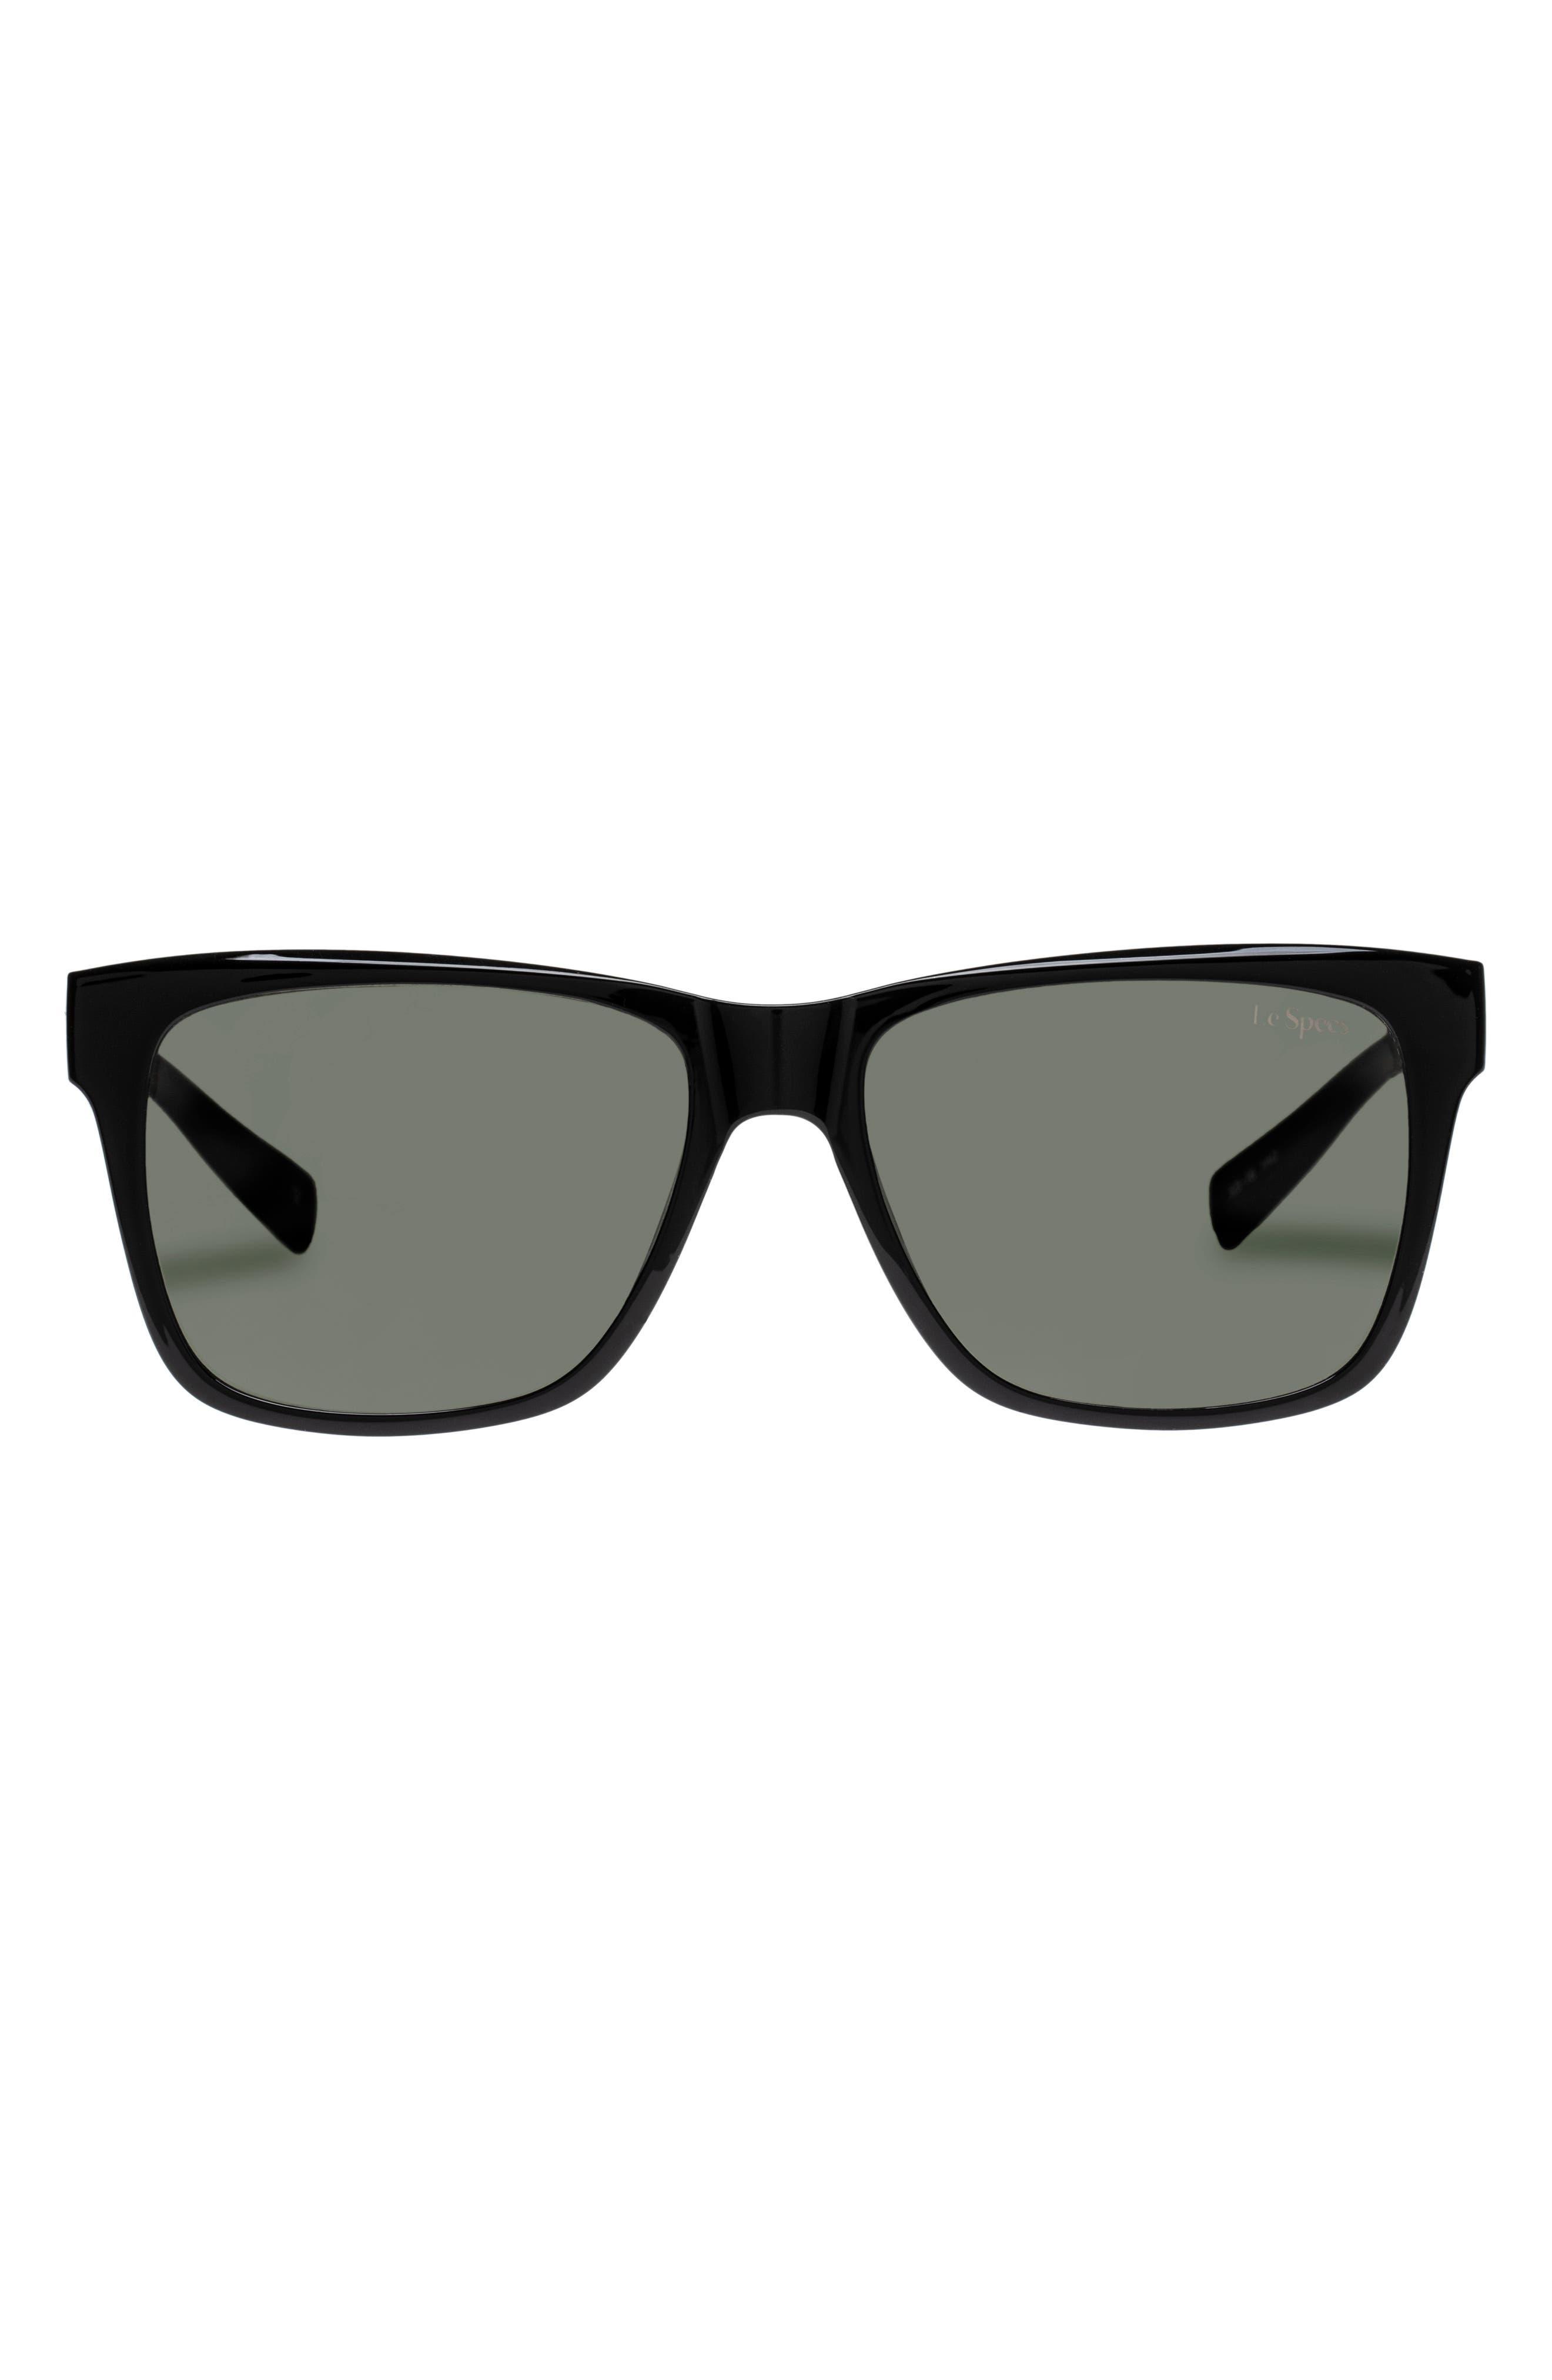 Systematci 55mm Sunglasses